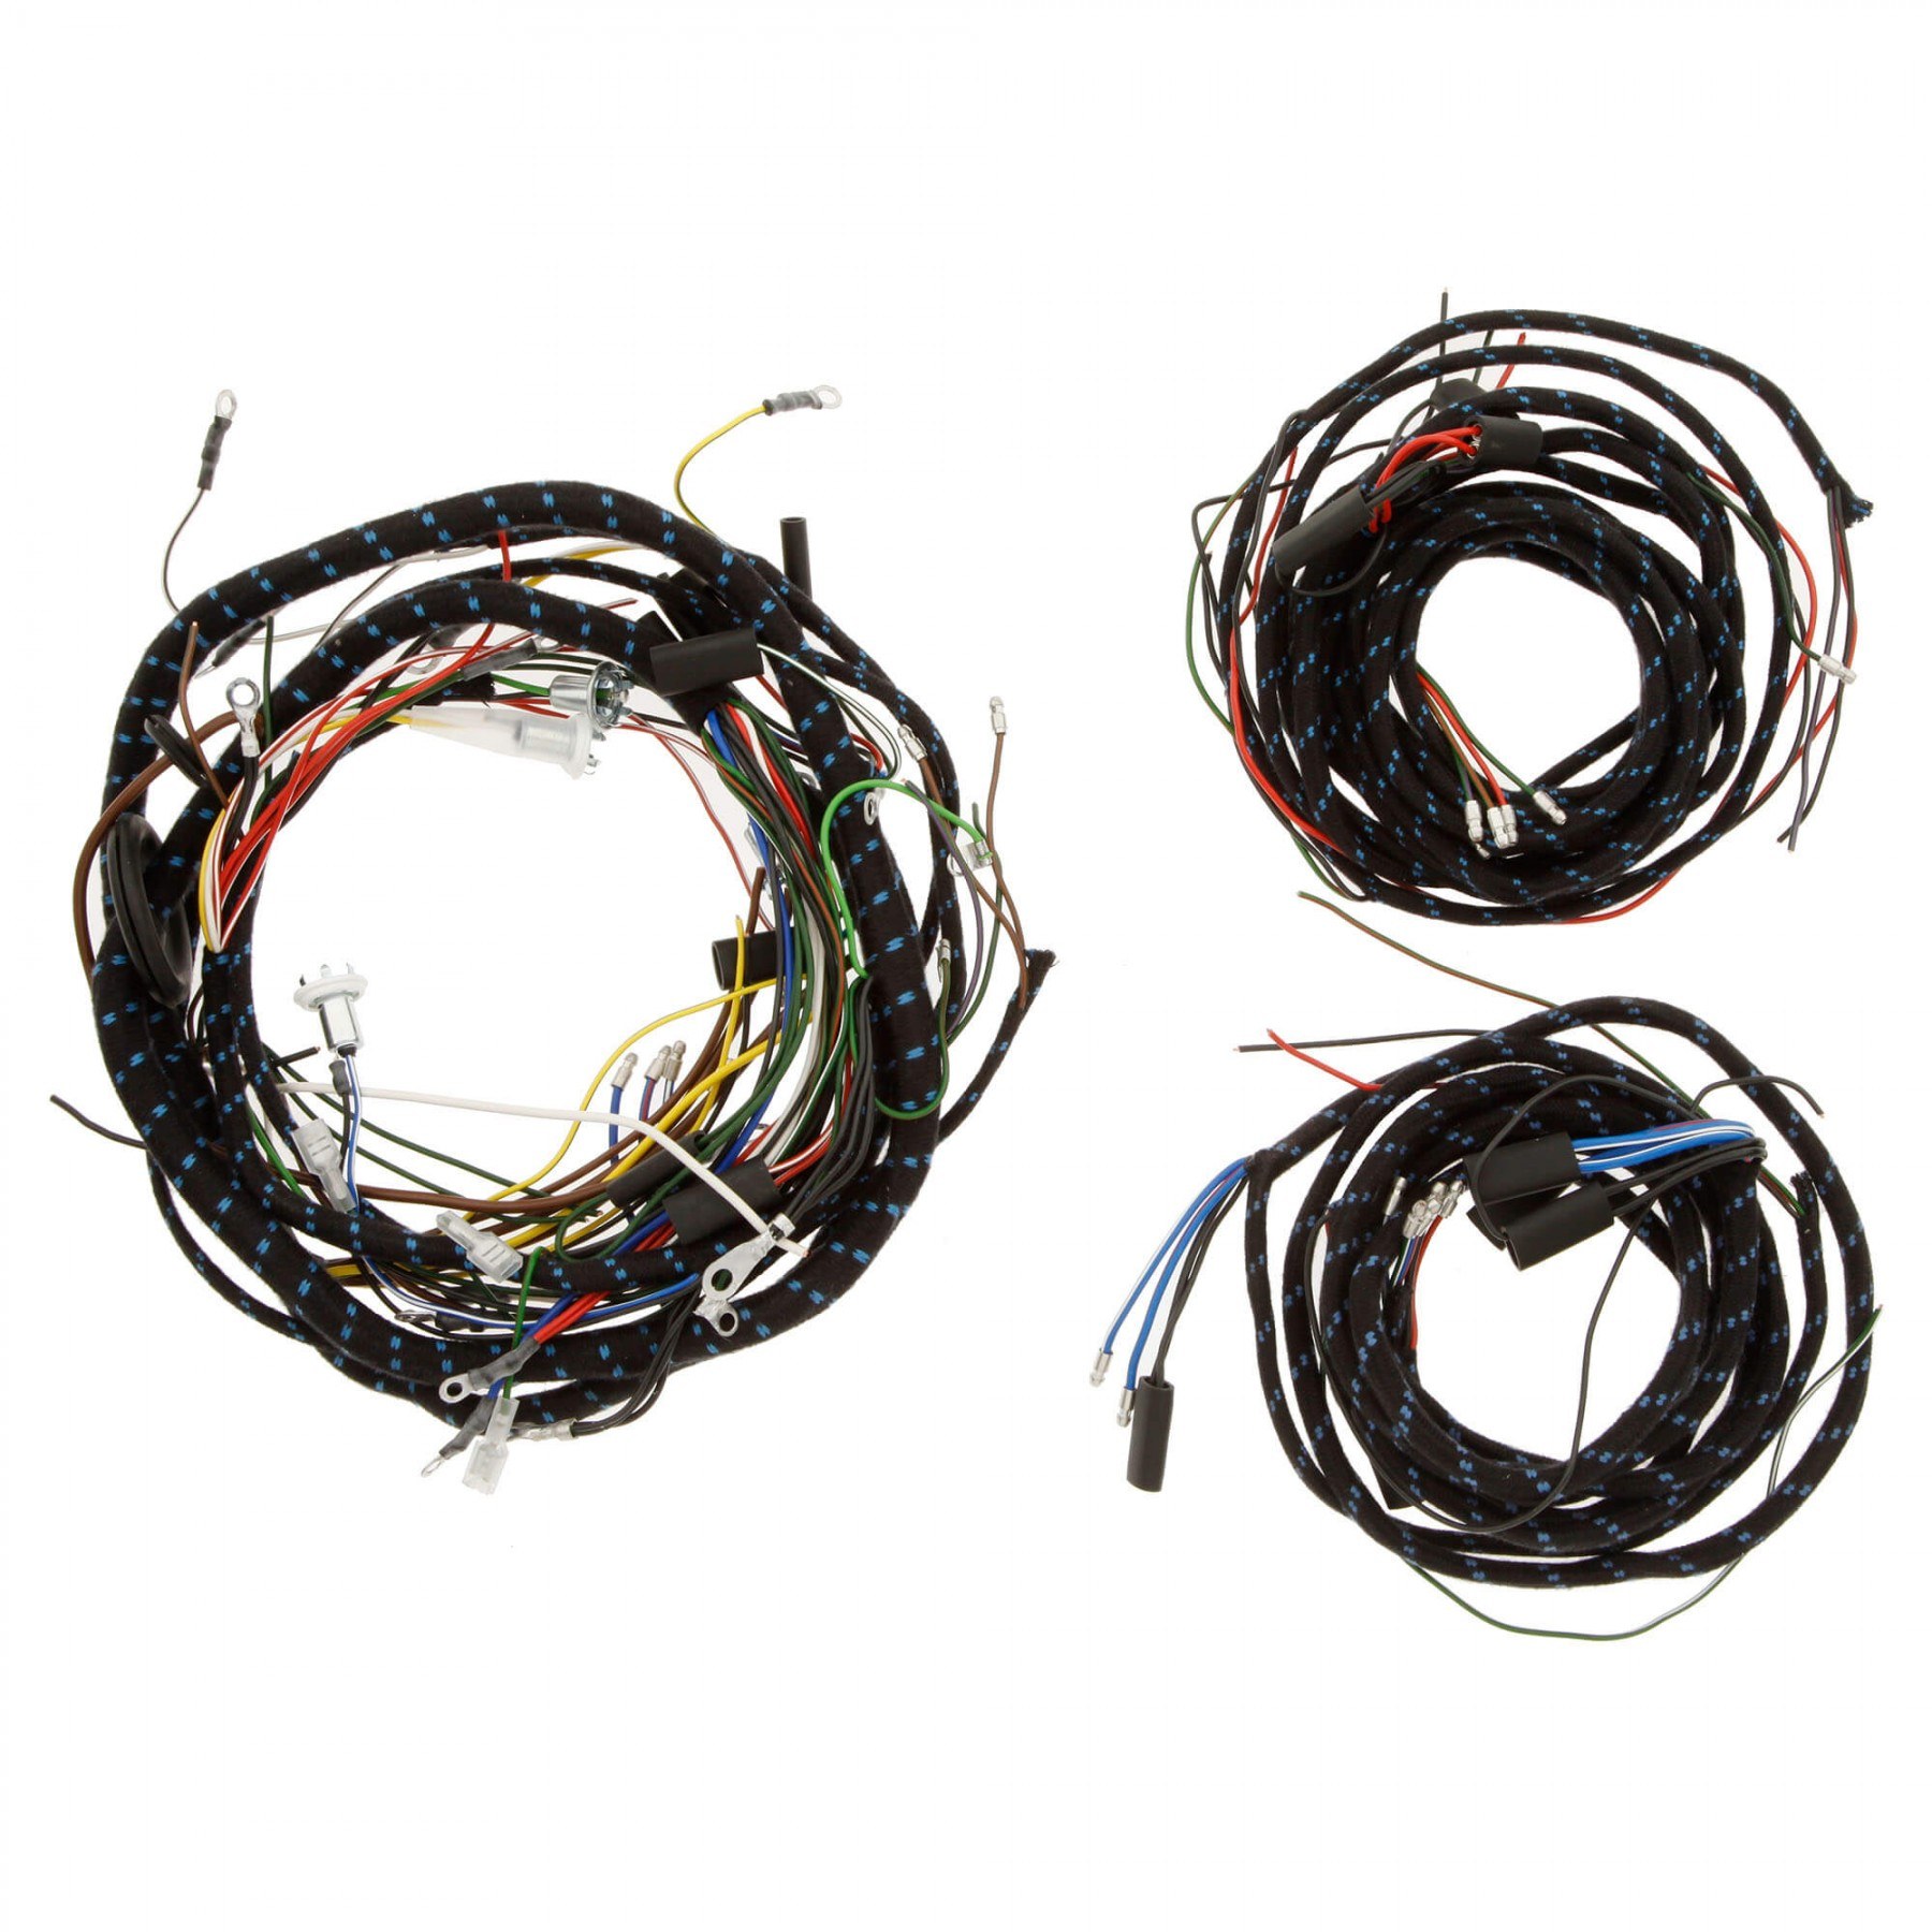 356 100 wiring harness cloth moss motors. Black Bedroom Furniture Sets. Home Design Ideas